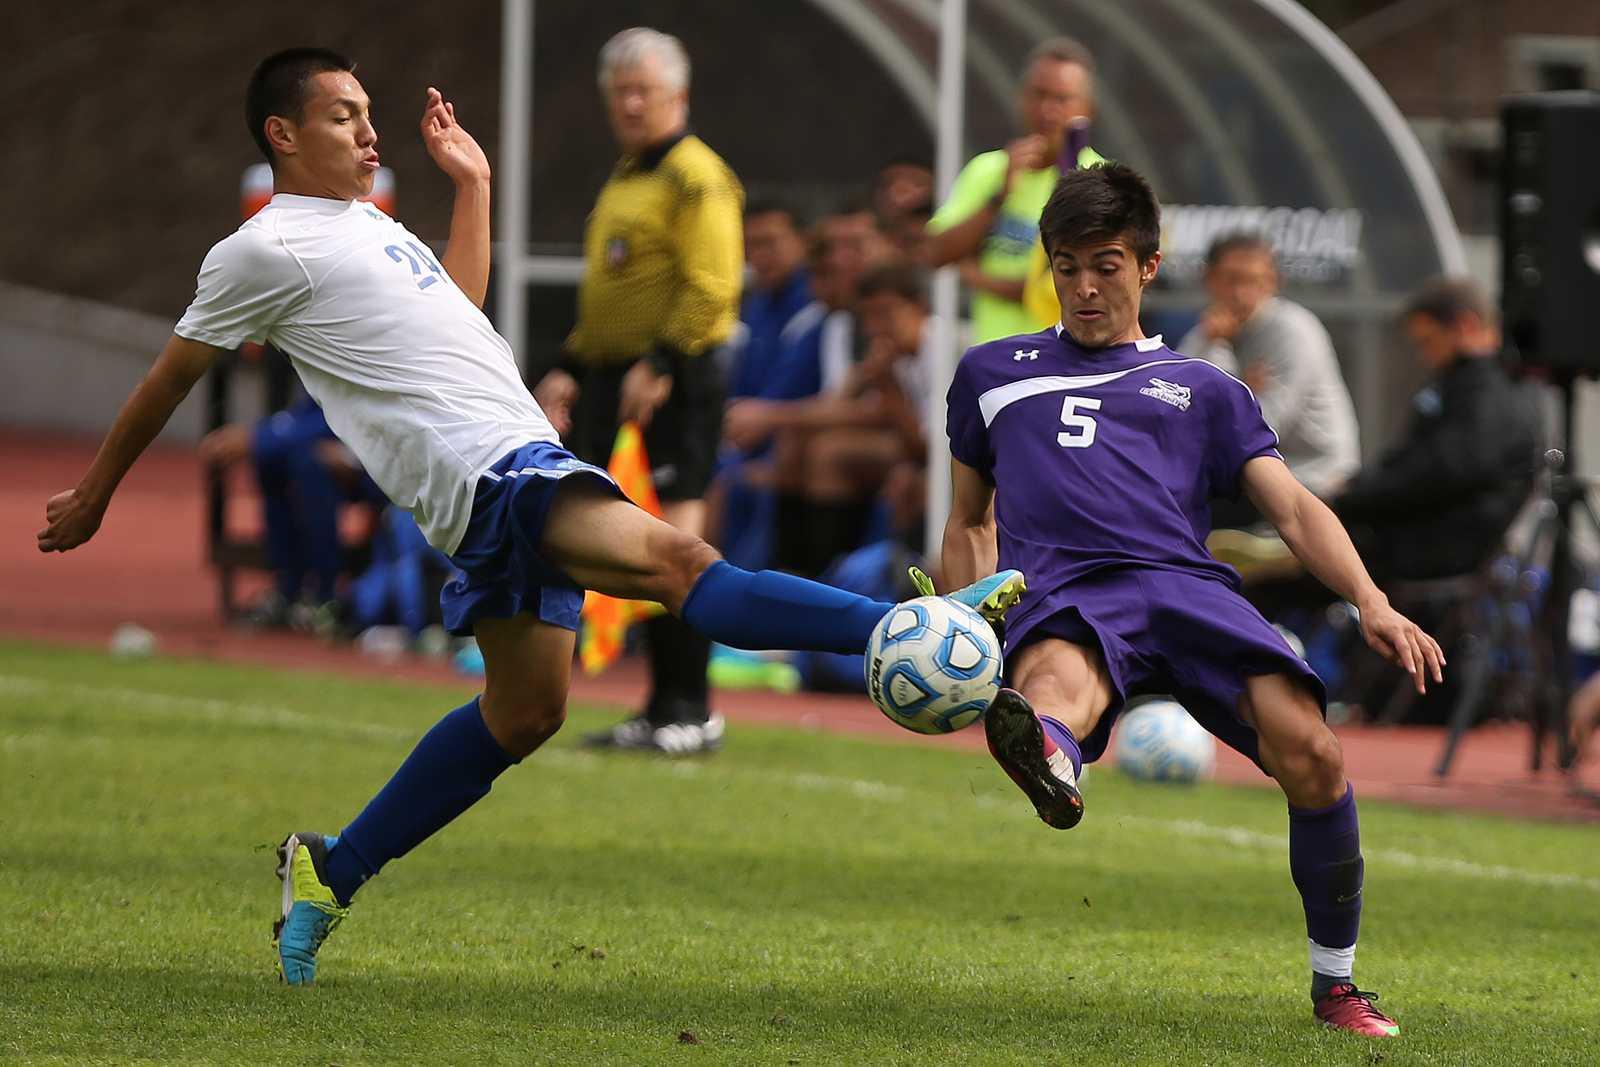 Men's soccer loses despite last minute goal